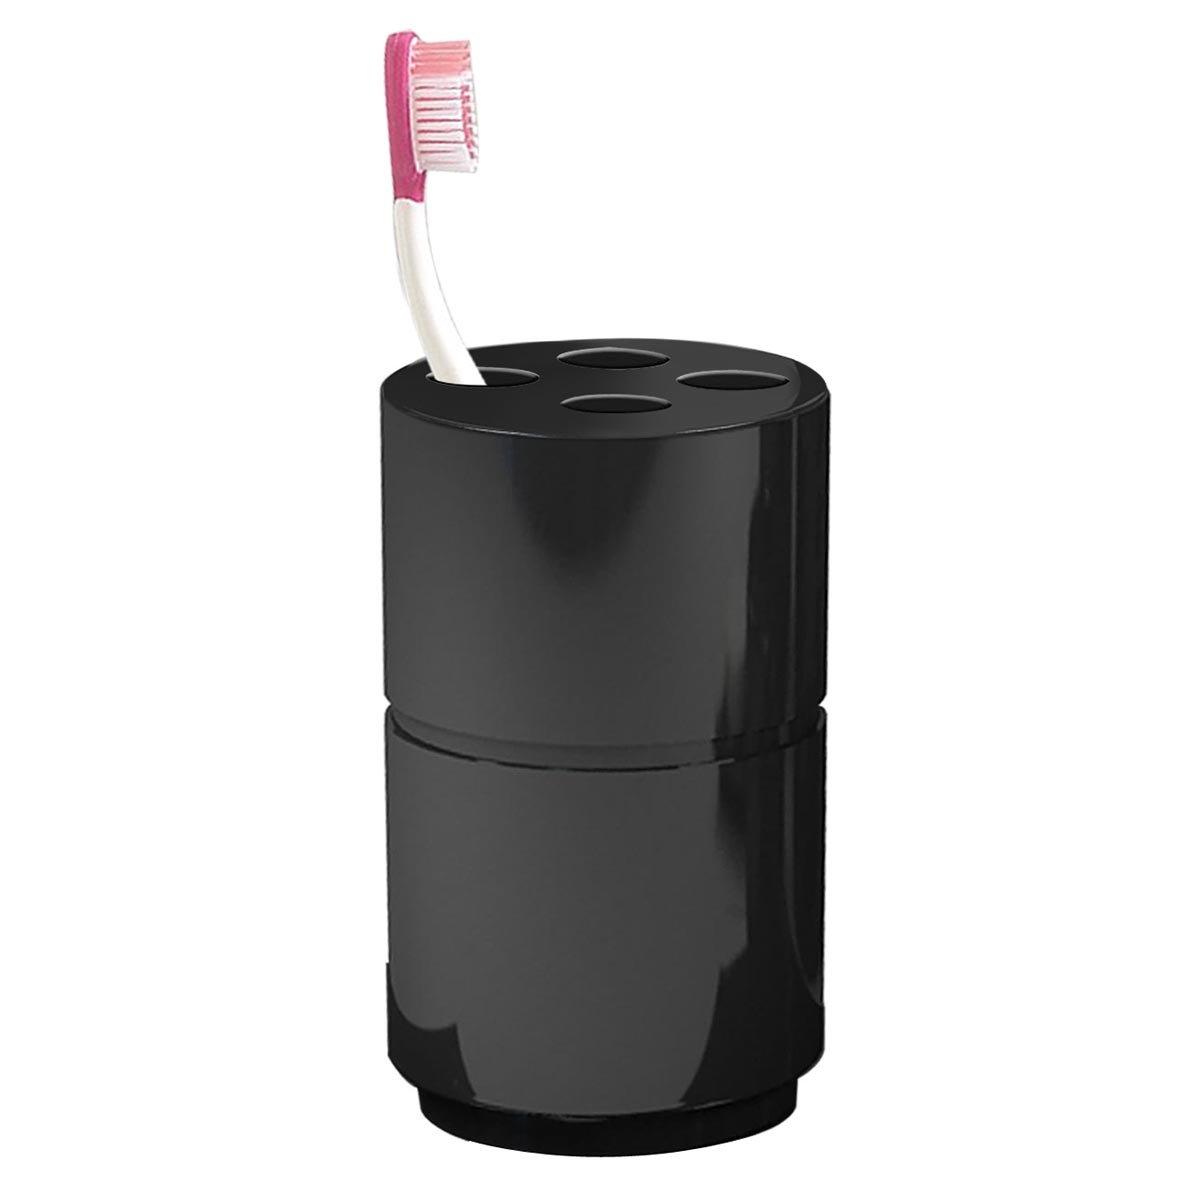 nu steel Loft Toothbrush Holder NU-Steel LT4H